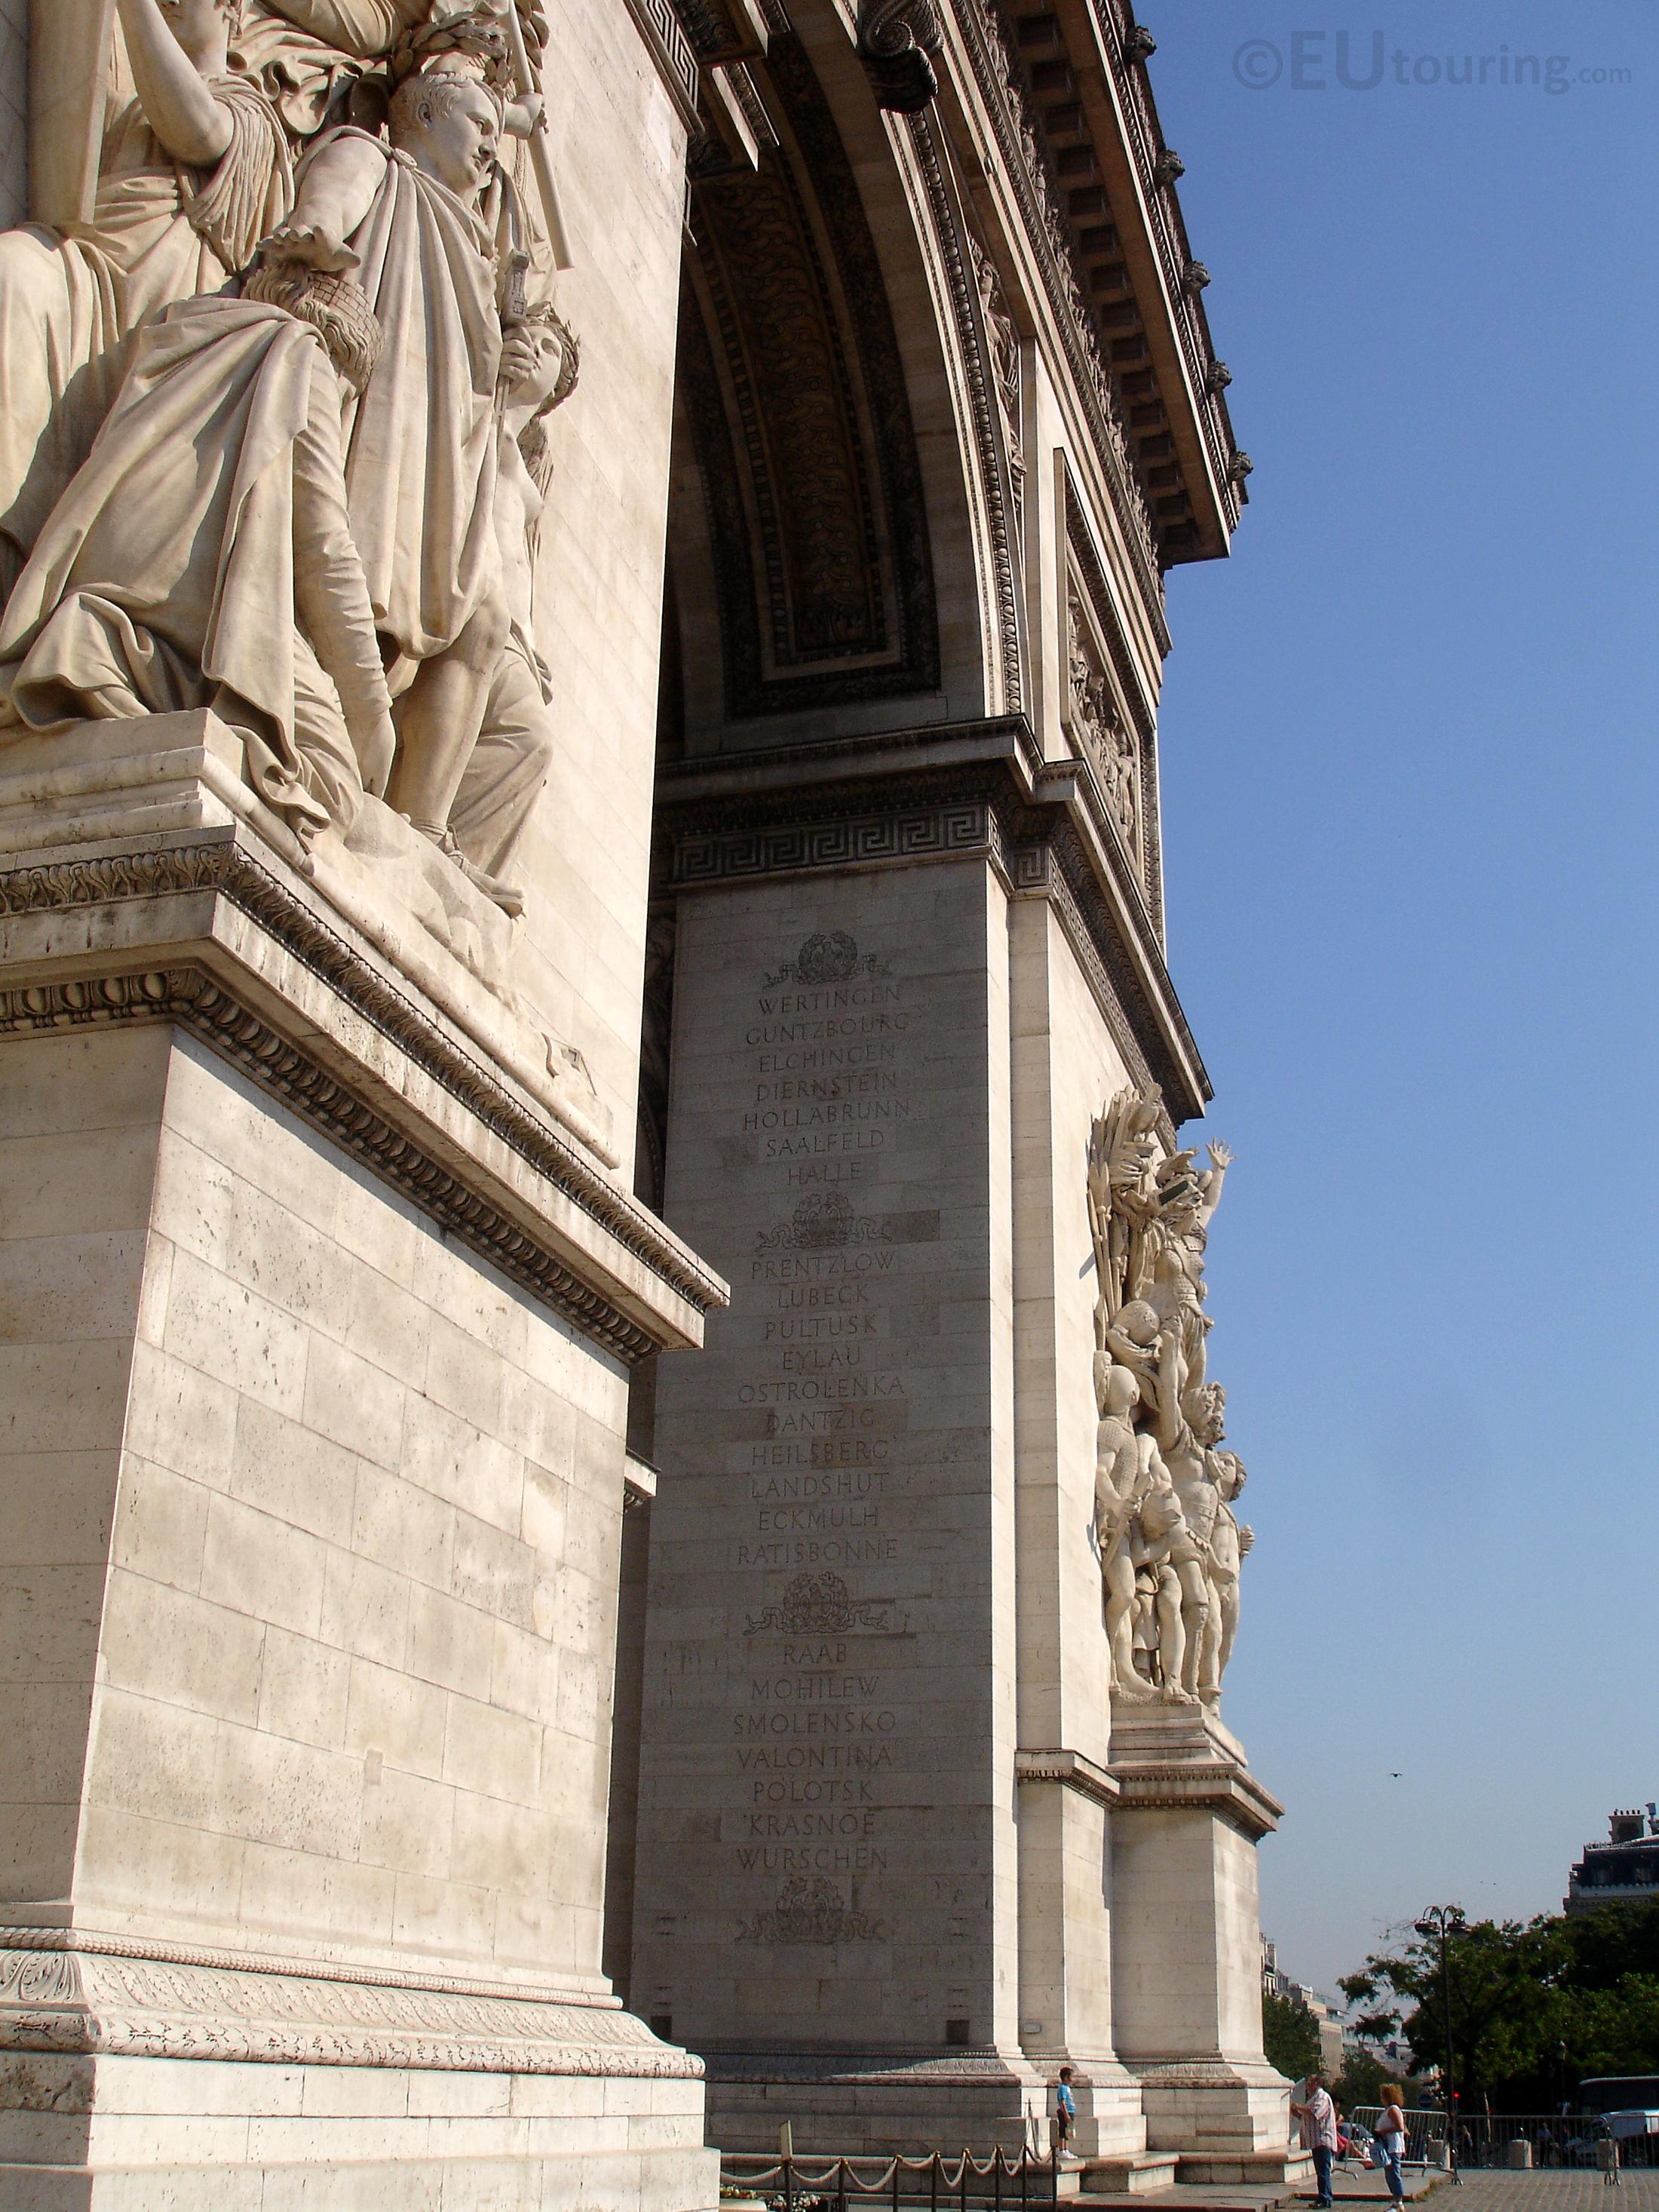 Two legs of Arc de Triomphe